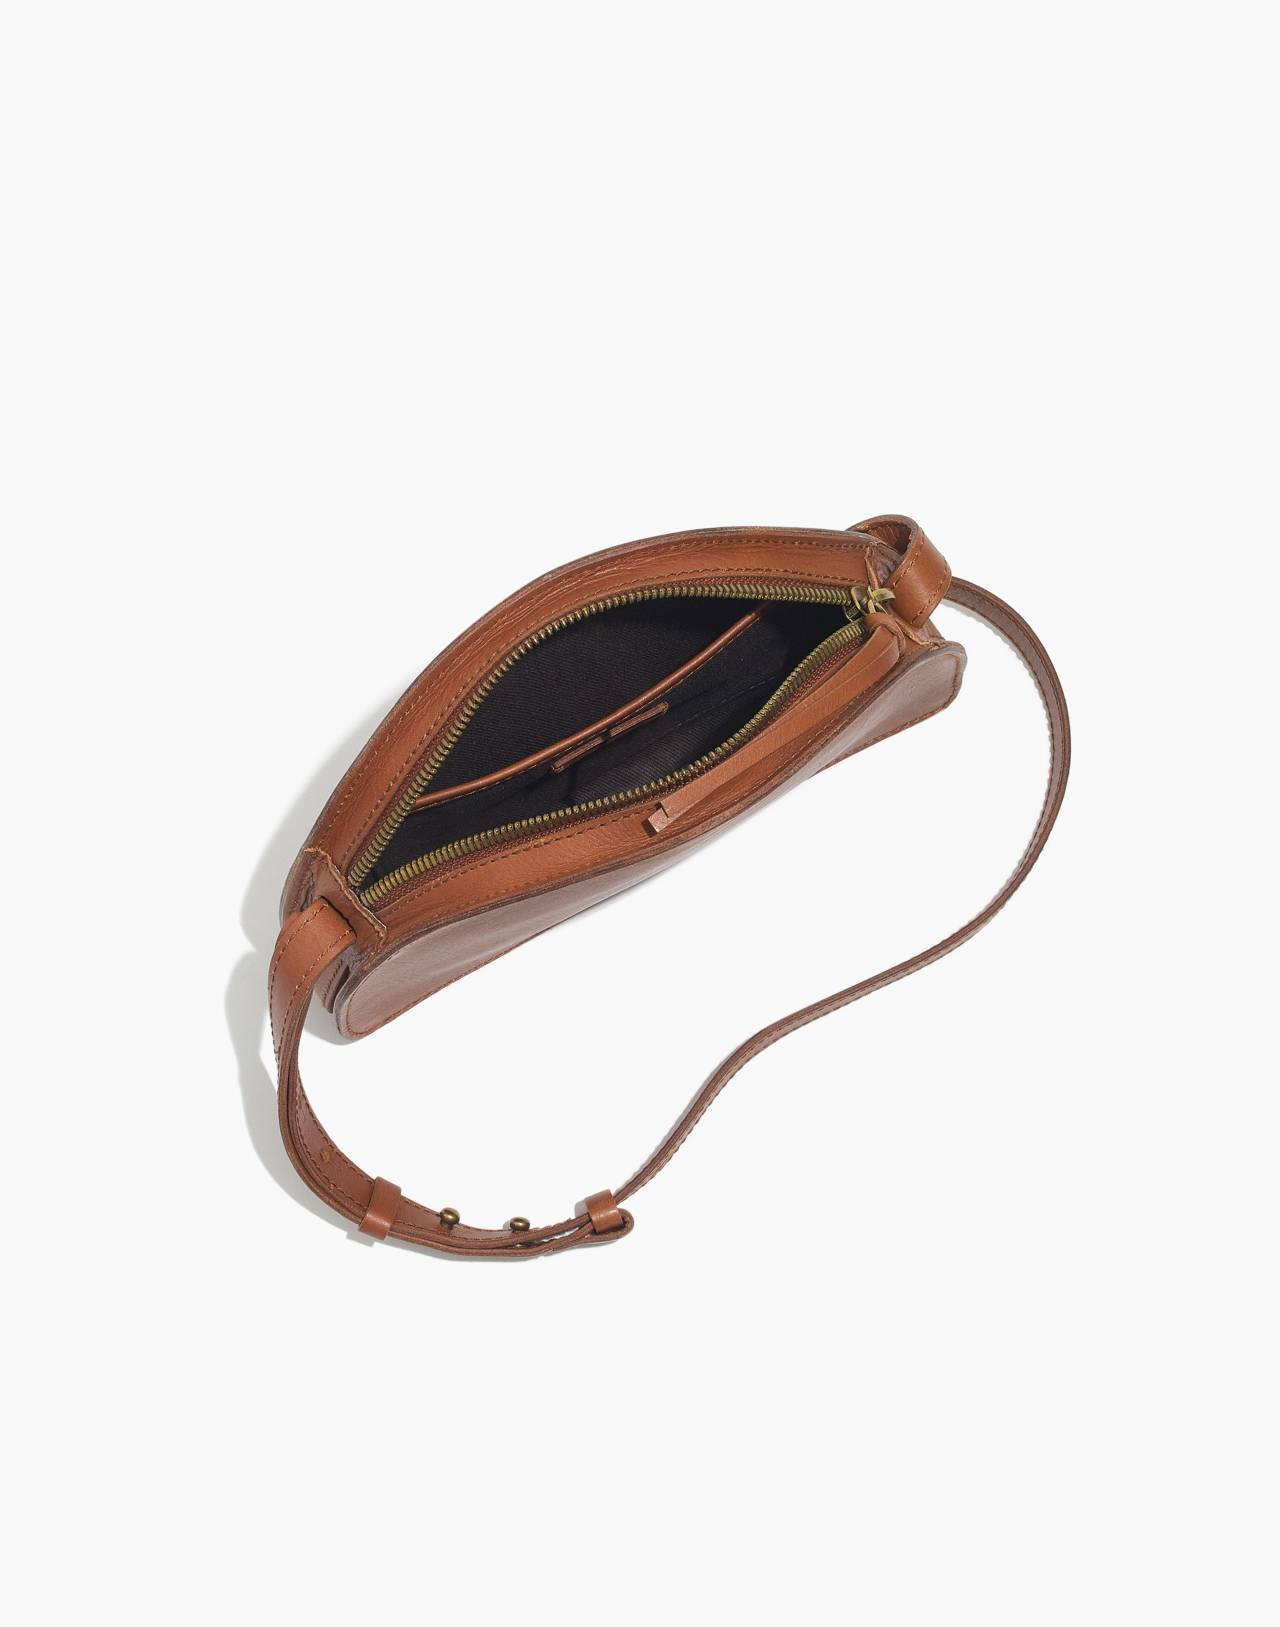 The Simple Half-Moon Crossbody Bag in english saddle image 2